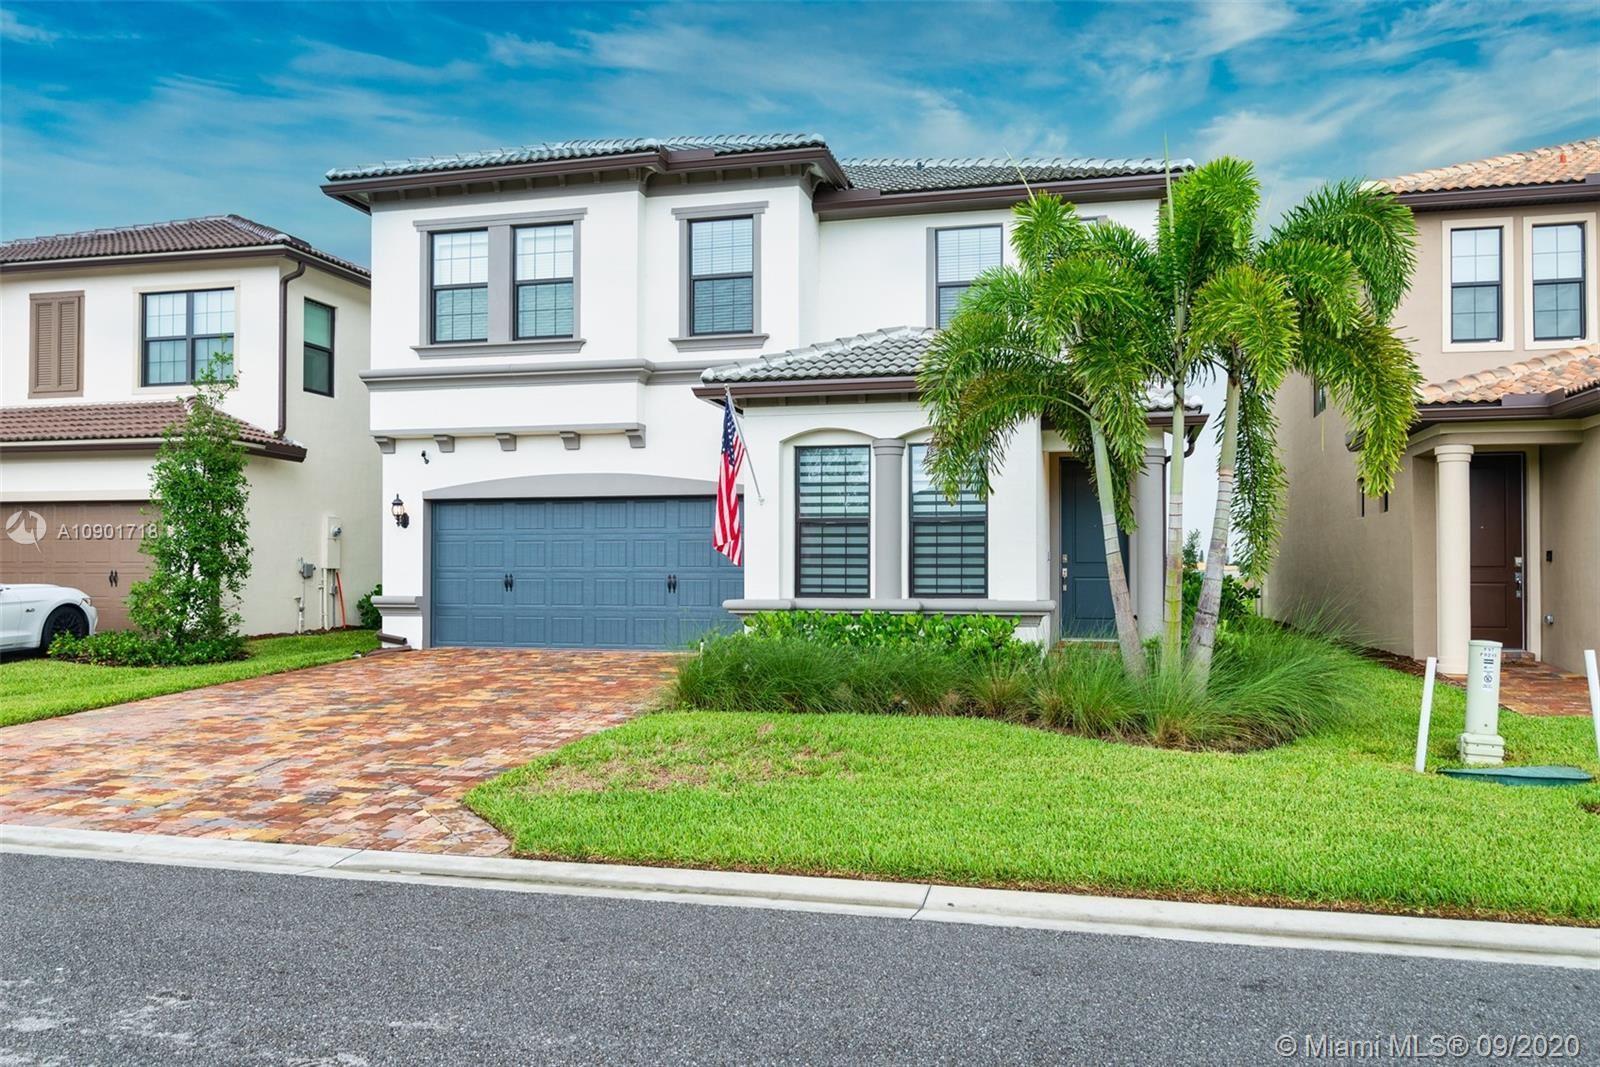 8215 Hanoverian Dr, Lake Worth, FL 33467 - #: A10901718